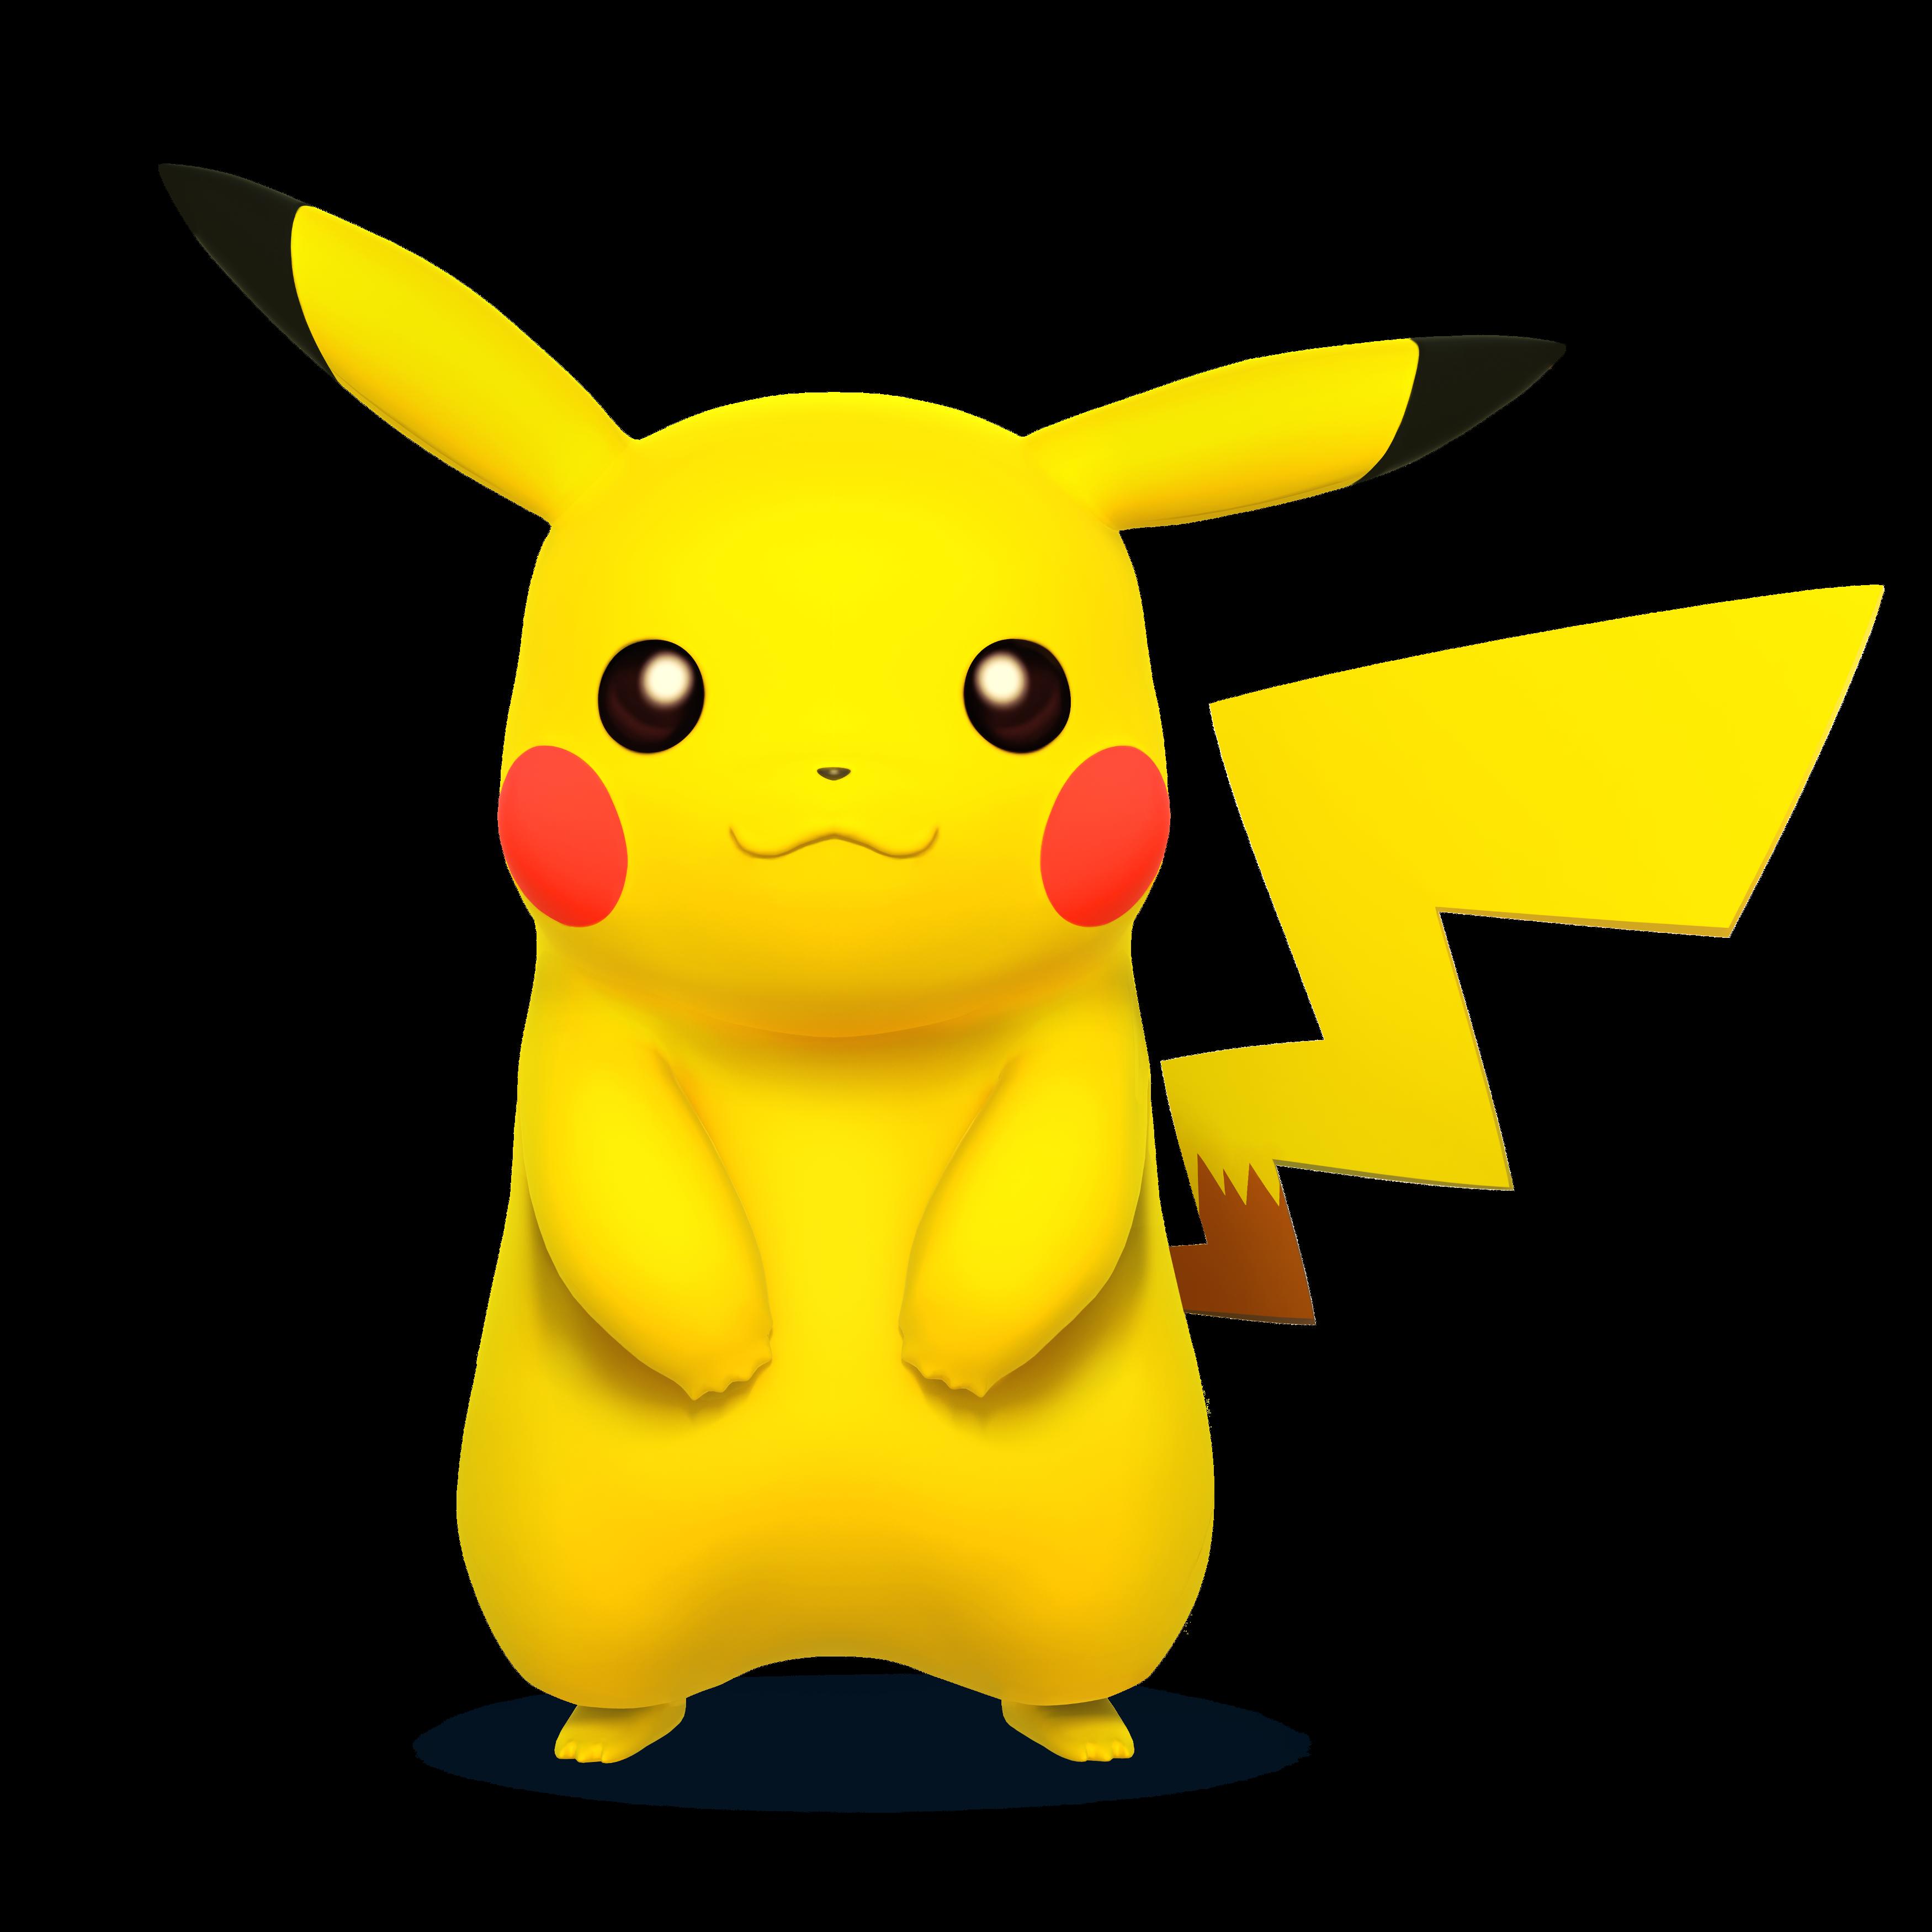 Pikachu clipart thunderbolt. Ssbh fantendo nintendo fanon